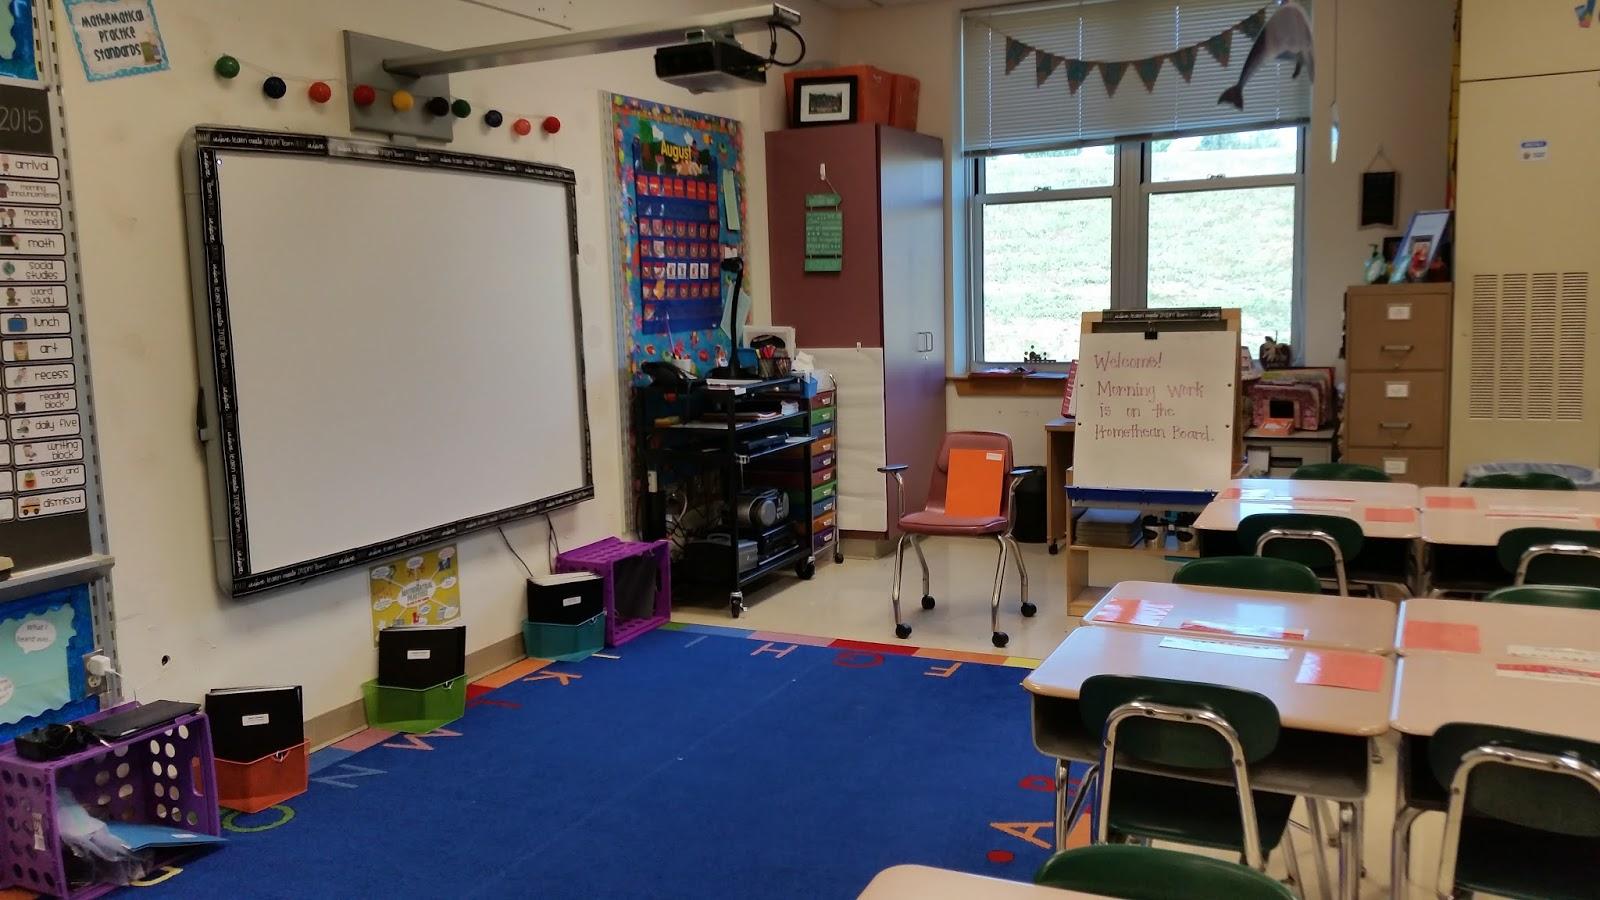 Kindergarten Calendar For Promethean Board : Mrs ramsburg s nd grade splash tour the classroom